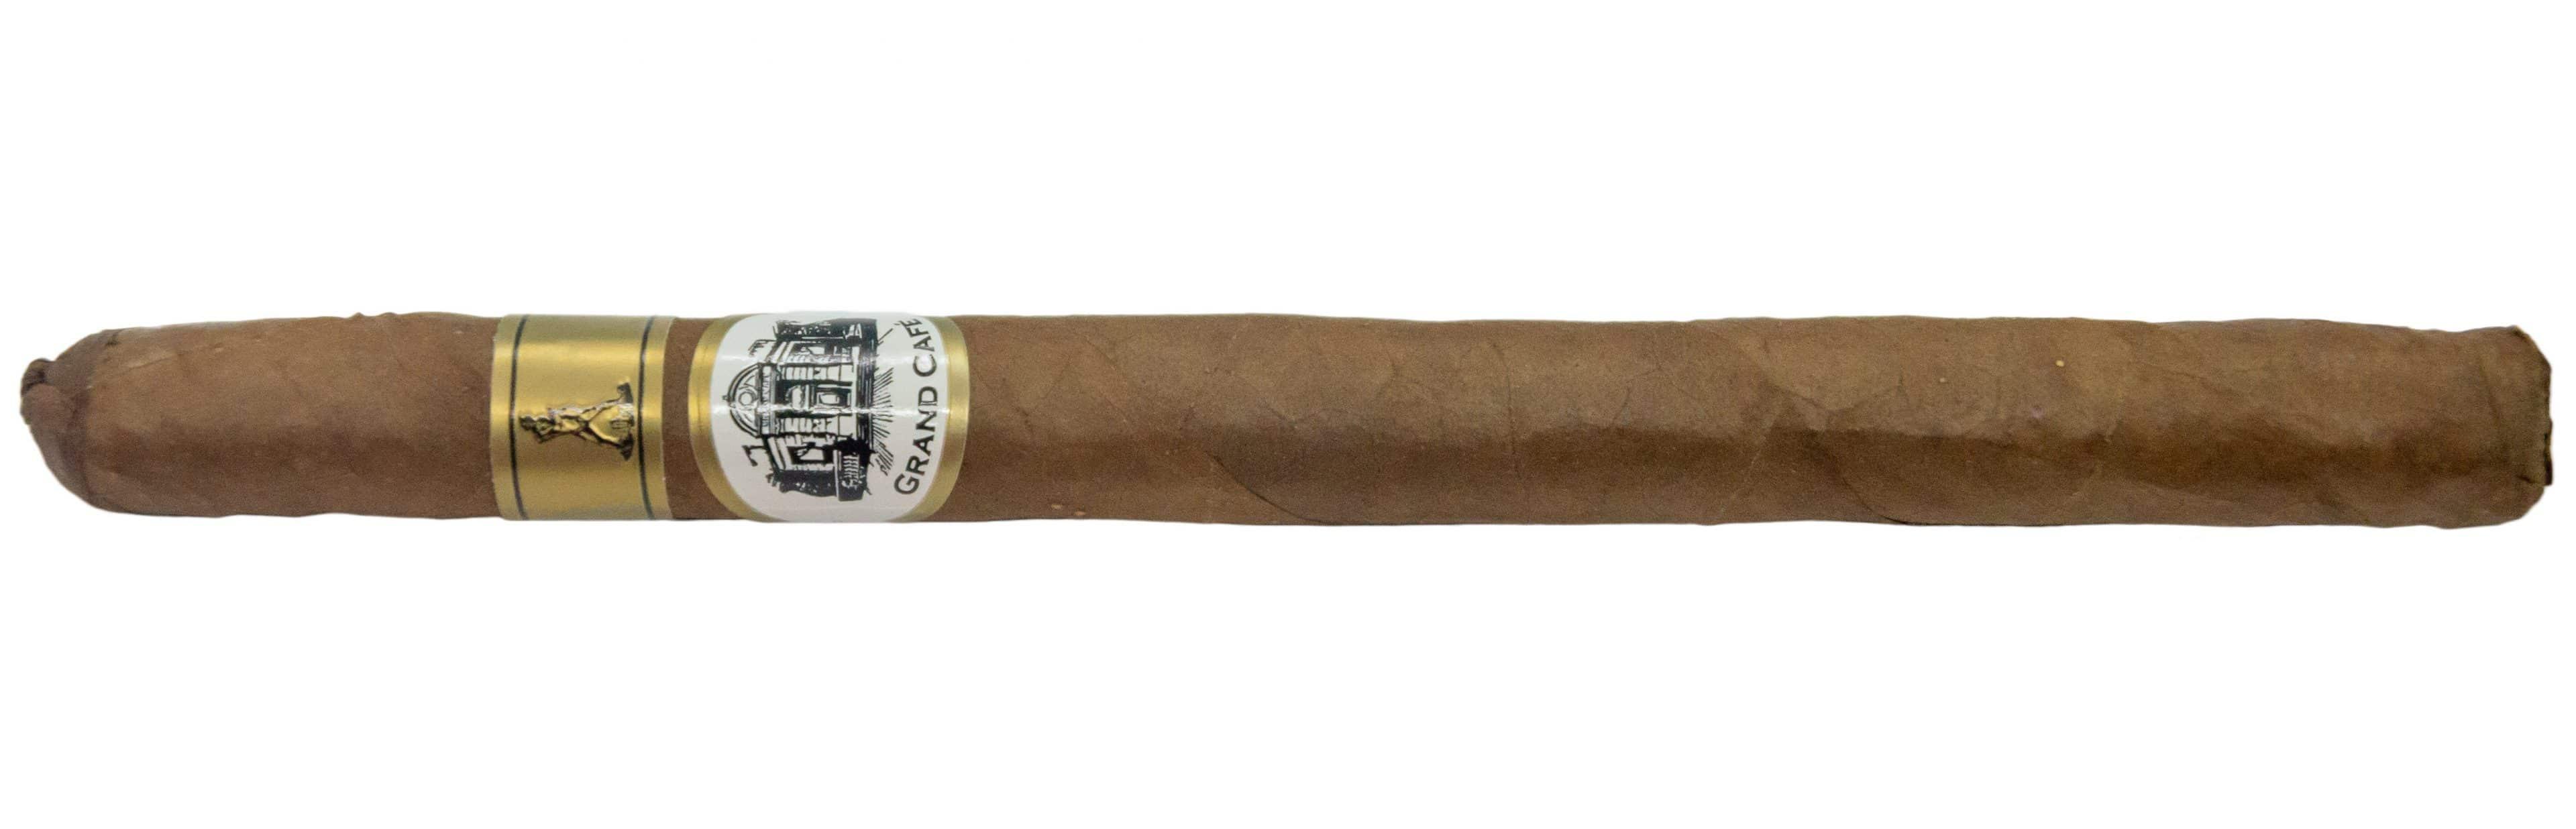 Blind Cigar Review: Bespoke | The Grand Cafe Lancero